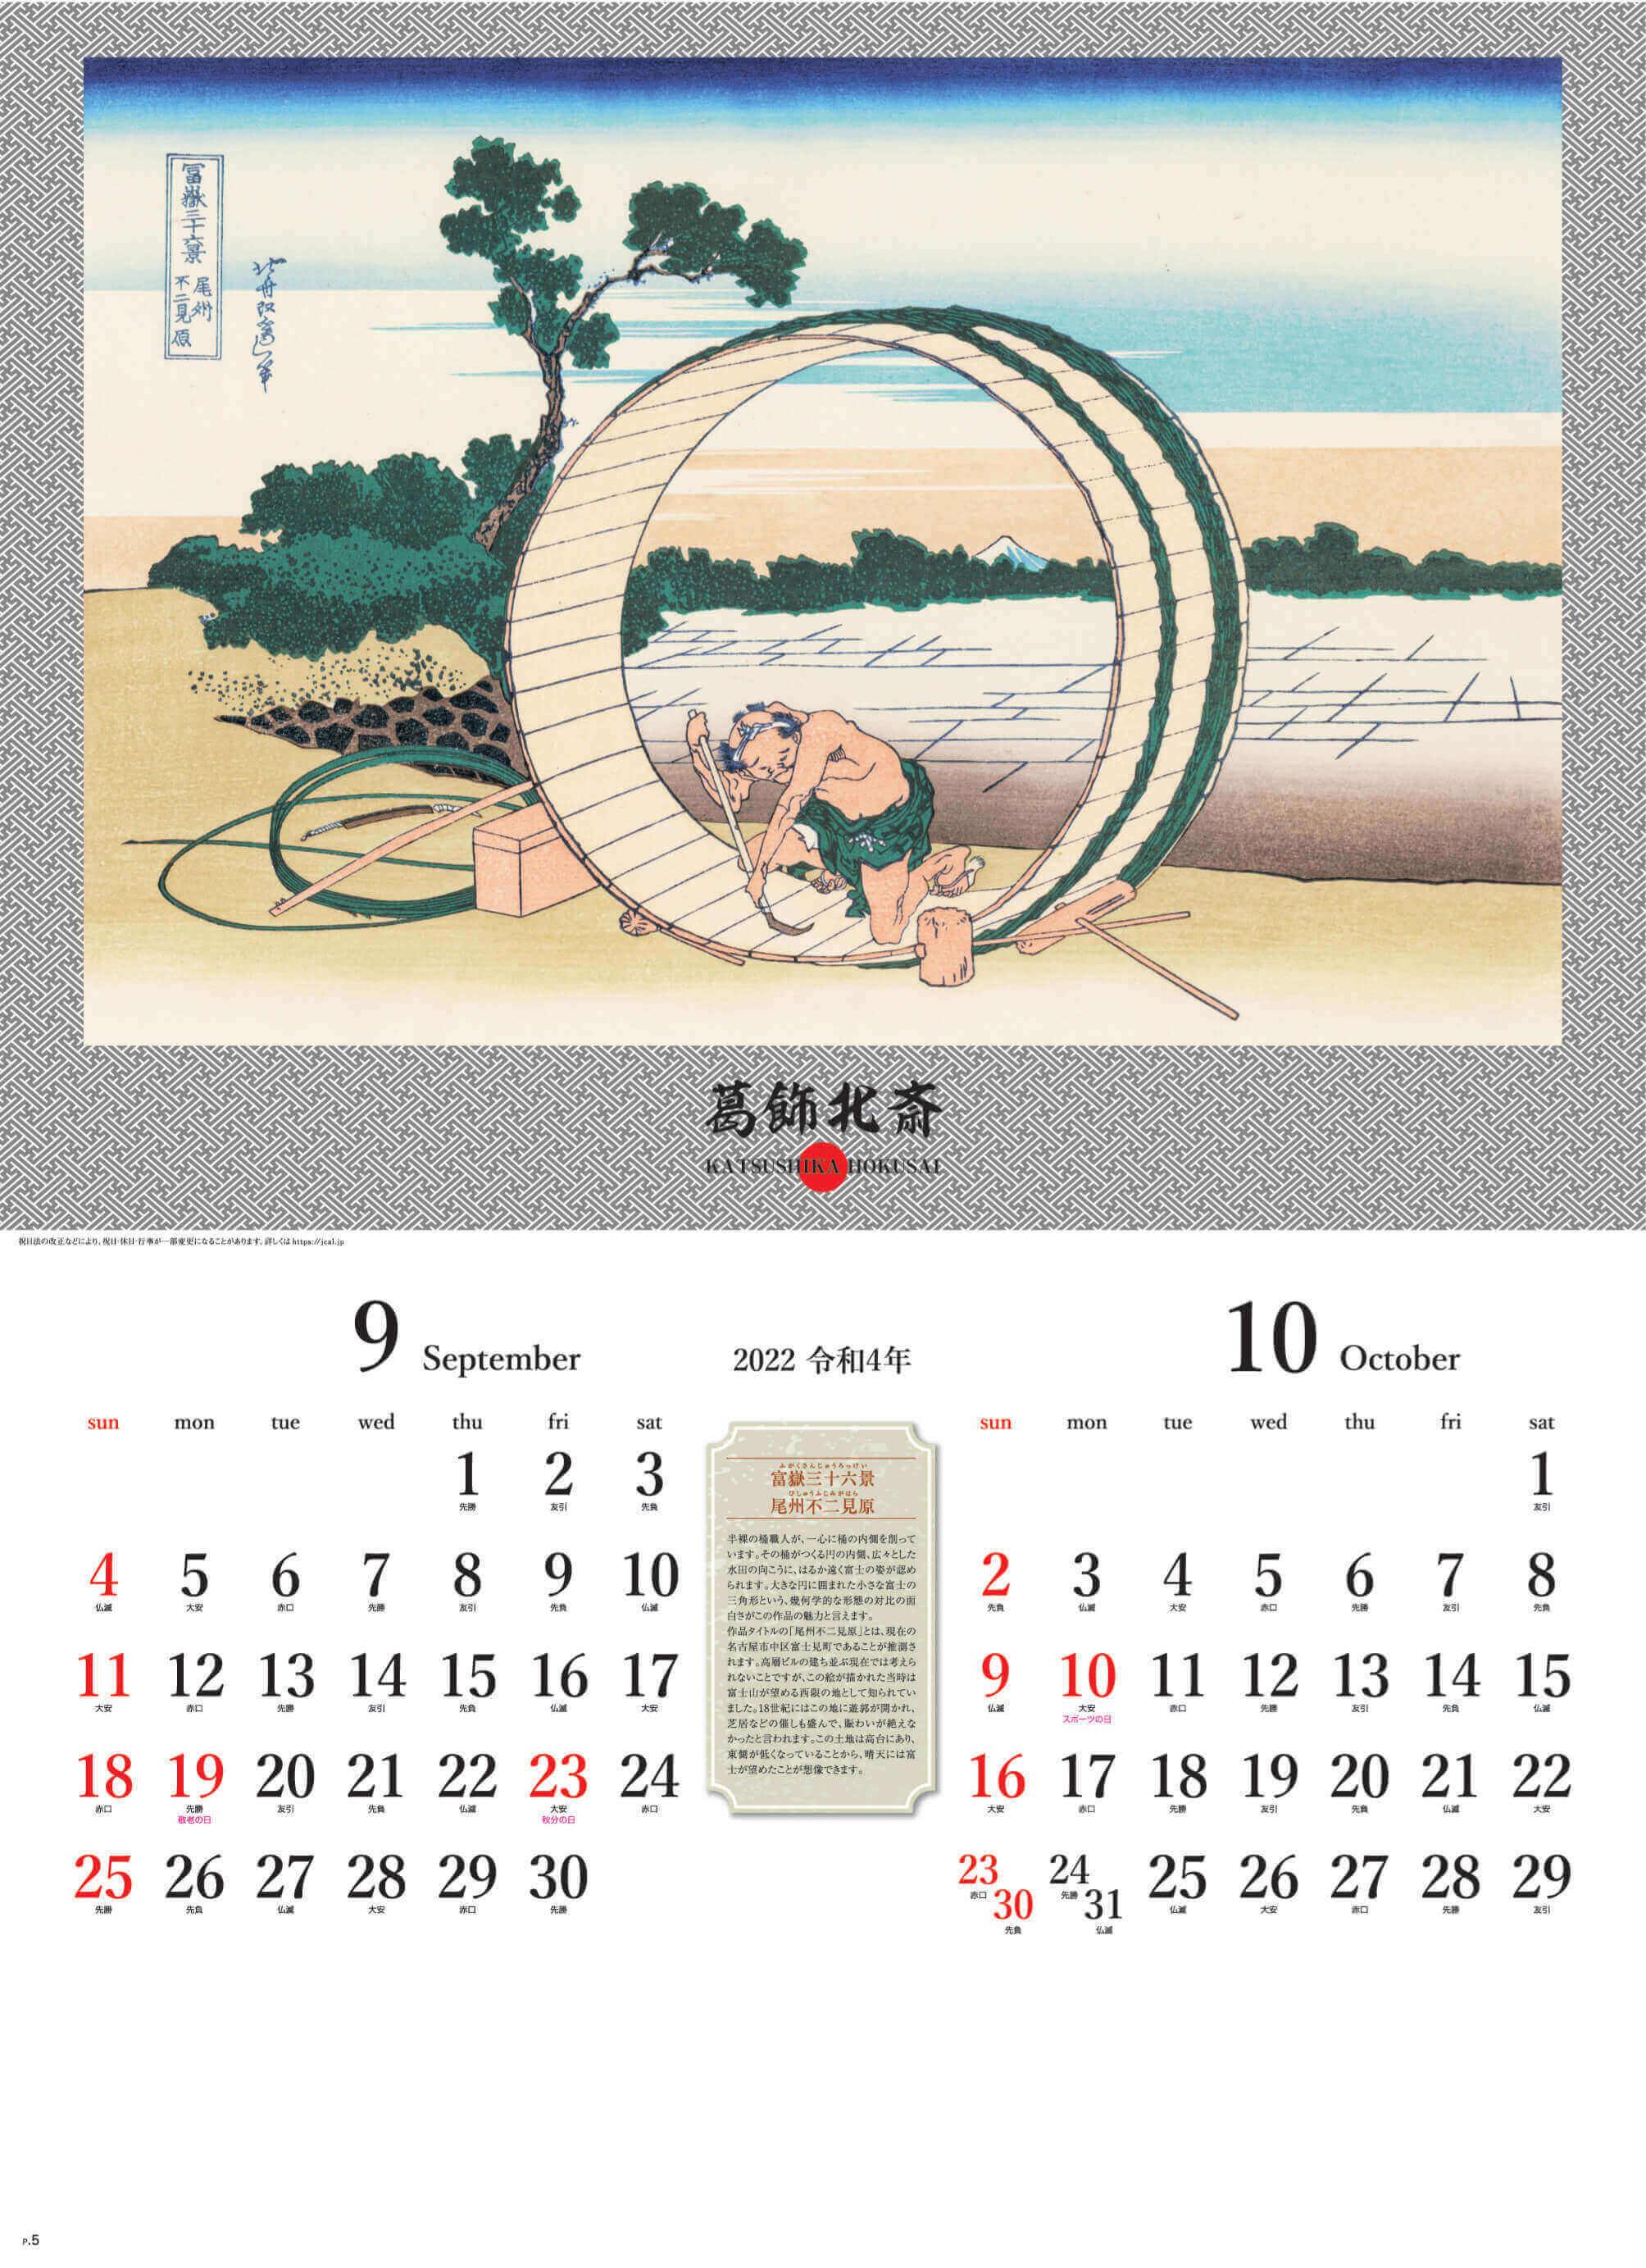 9−10月 富嶽三十六景 尾州不二見原 葛飾北斎 2022年カレンダーの画像